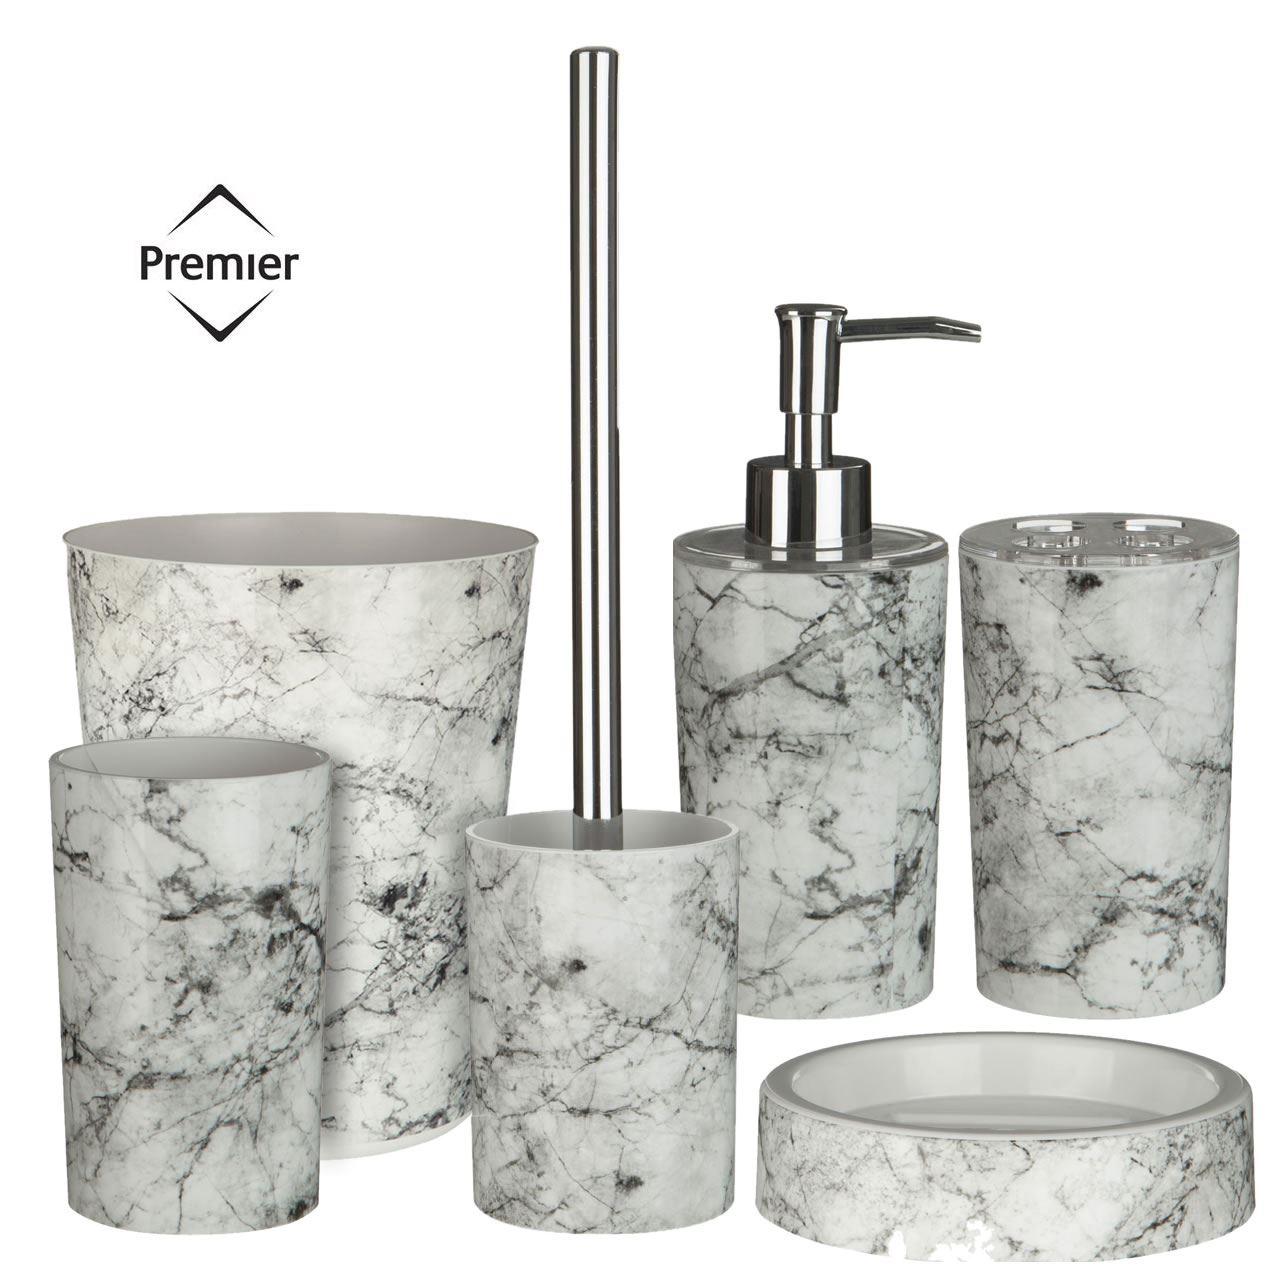 6pc rome bathroom set toilet brush tumbler soap for Bathroom tumbler sets